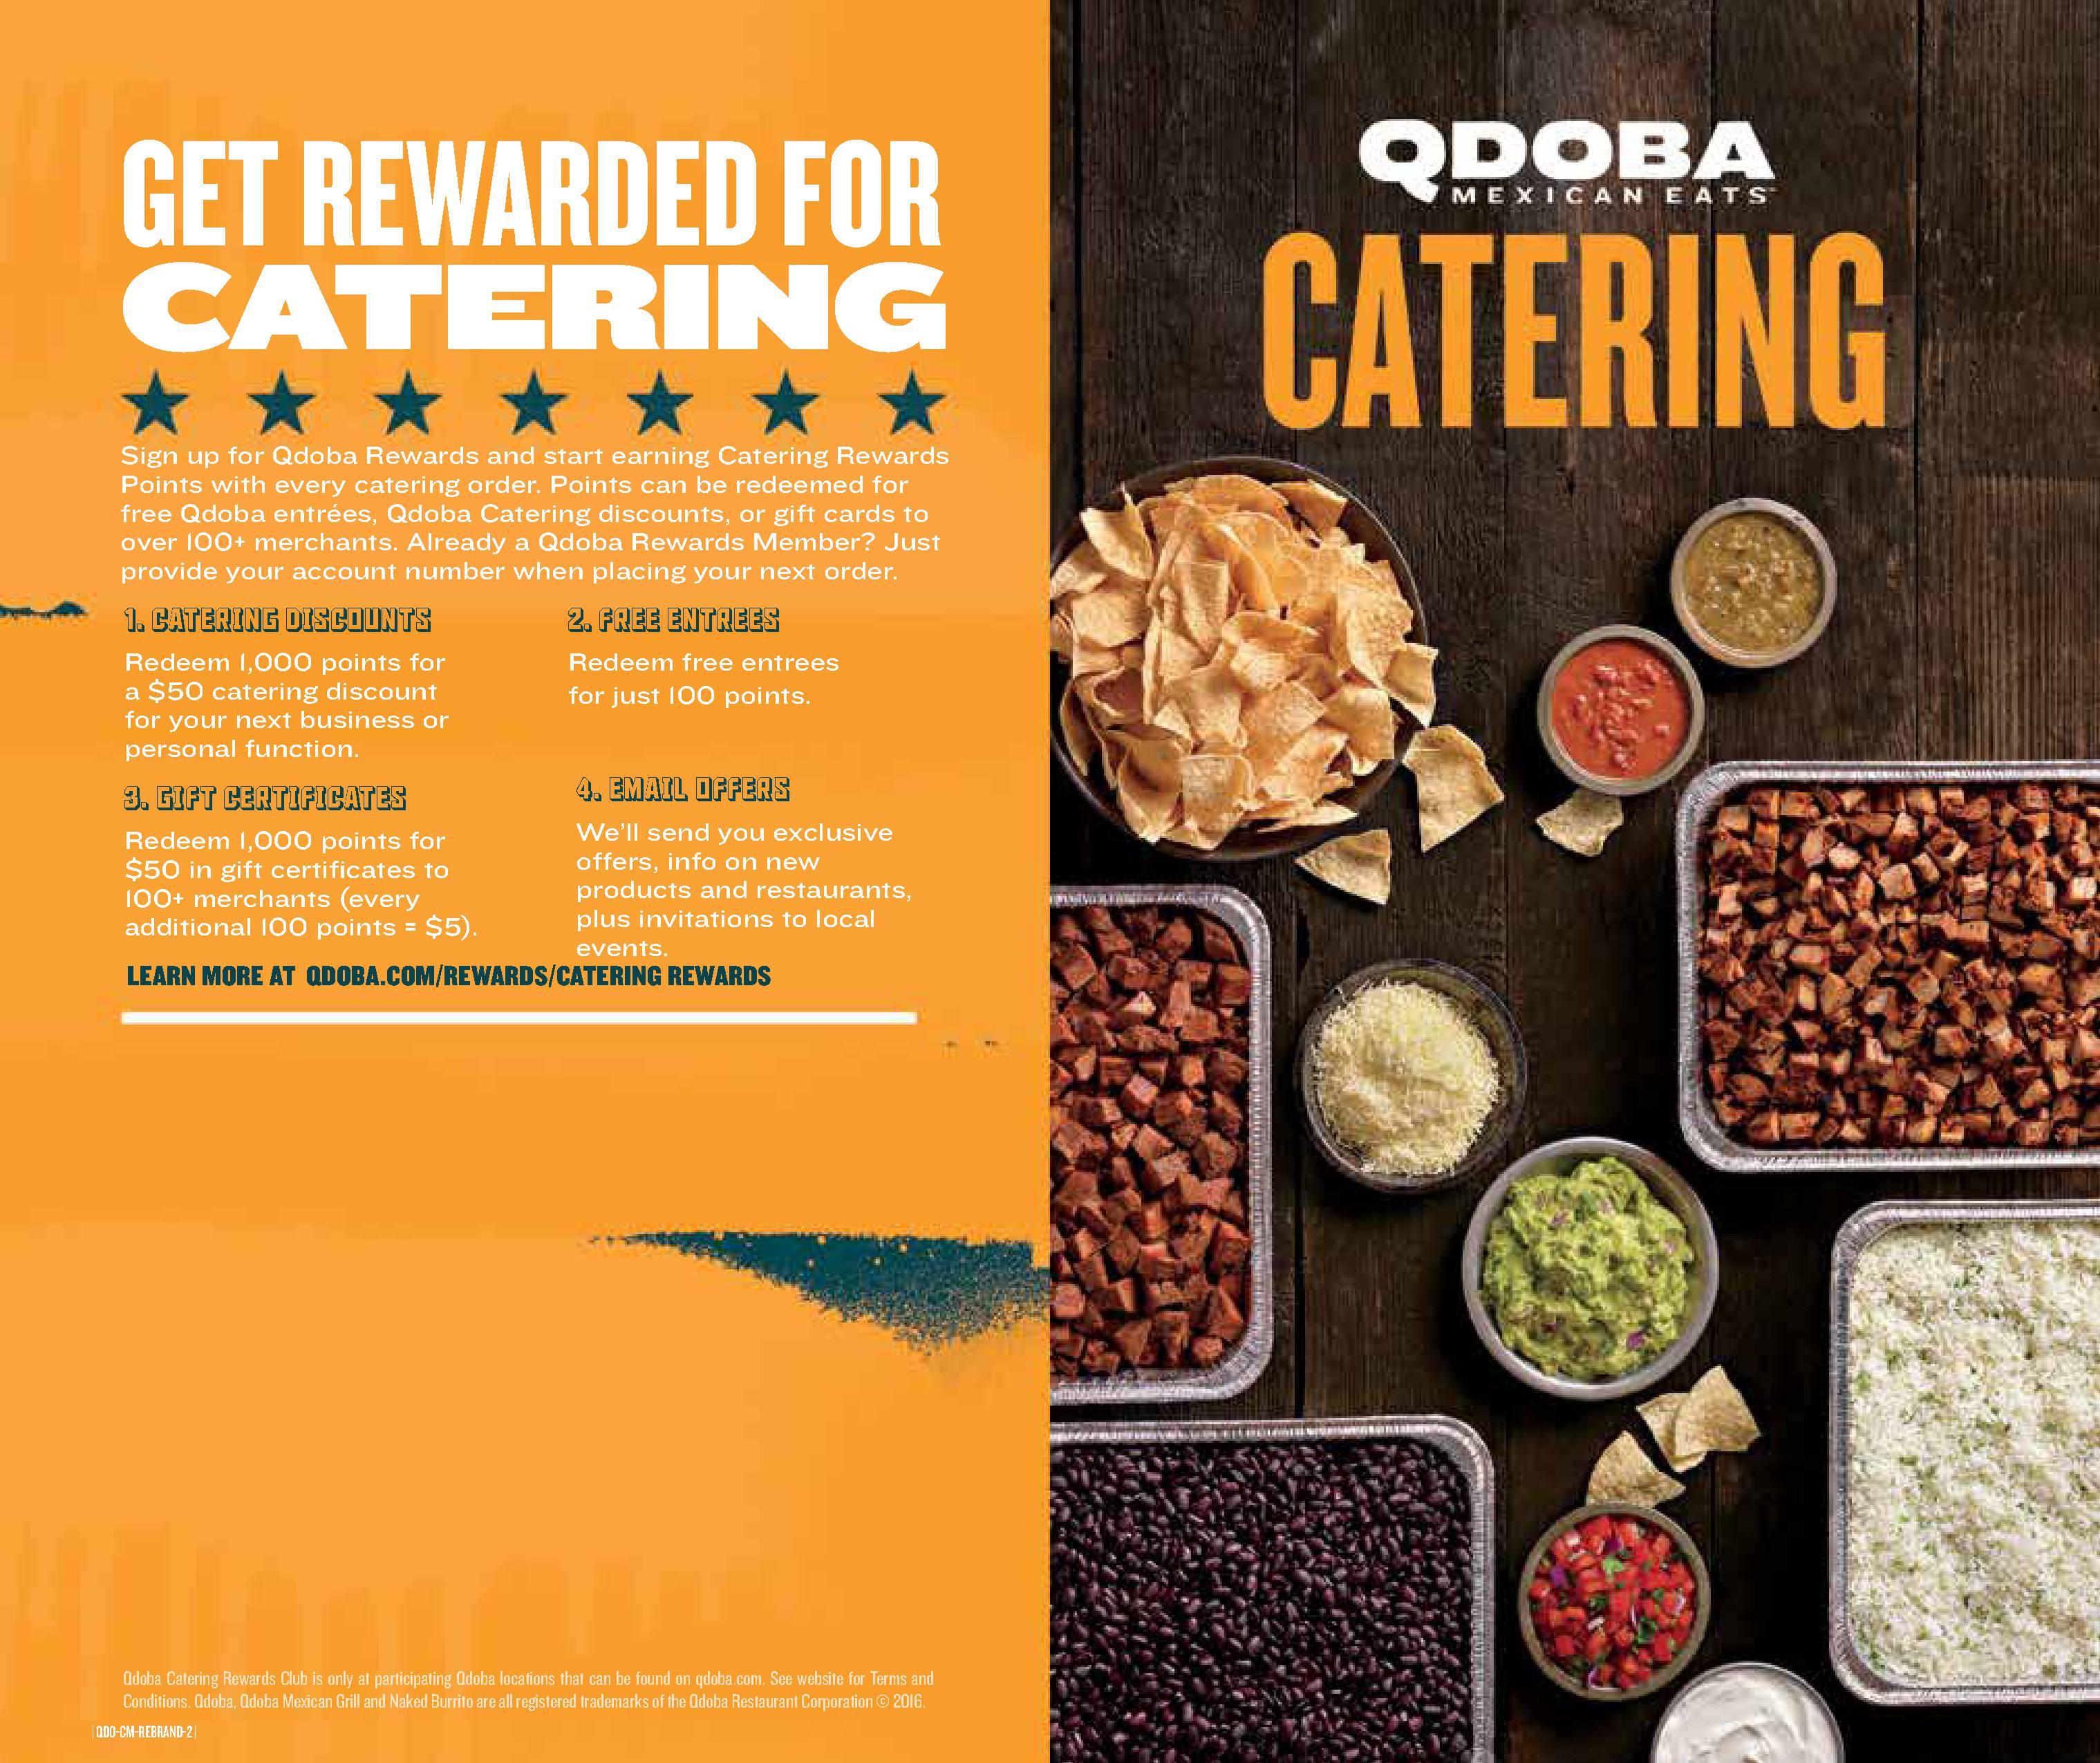 CaterDMV - A Brand New Experience in Catering | Qdoba MenuCaterDMV ...